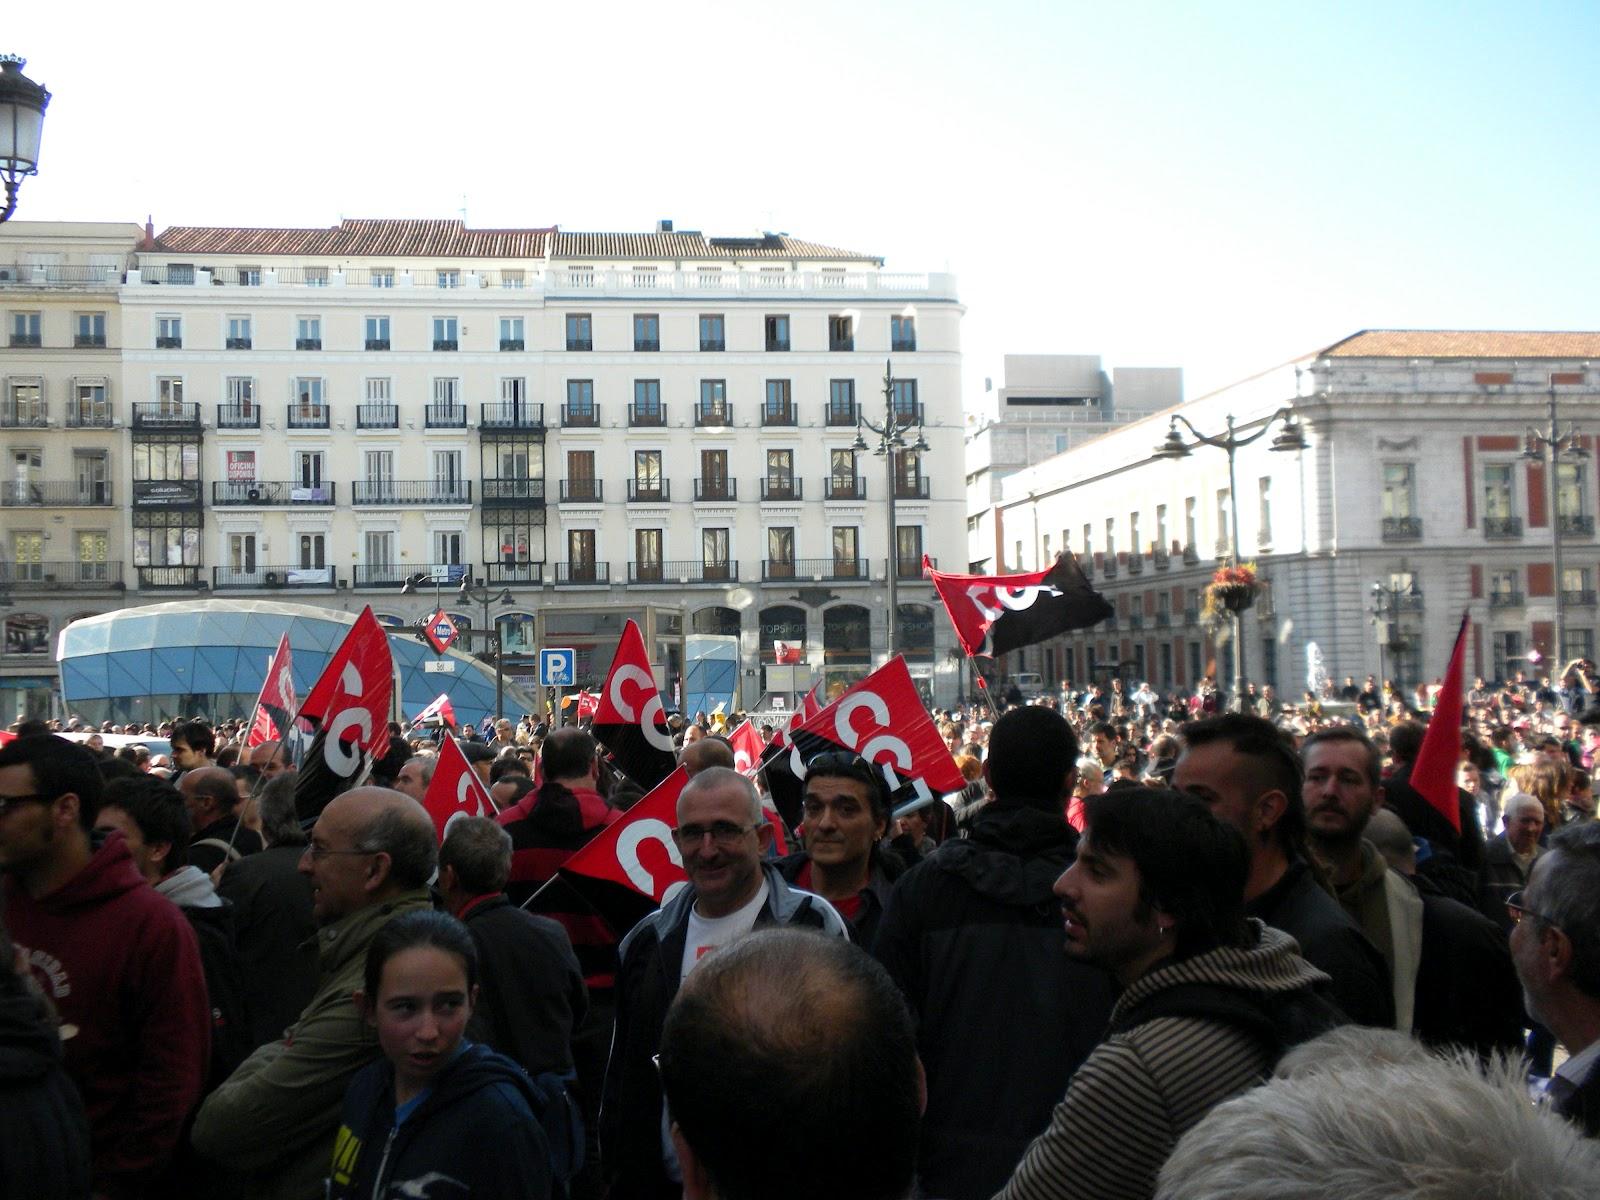 Impresiones desde sierra noroeste de madrid cr nica for Madrid noroeste